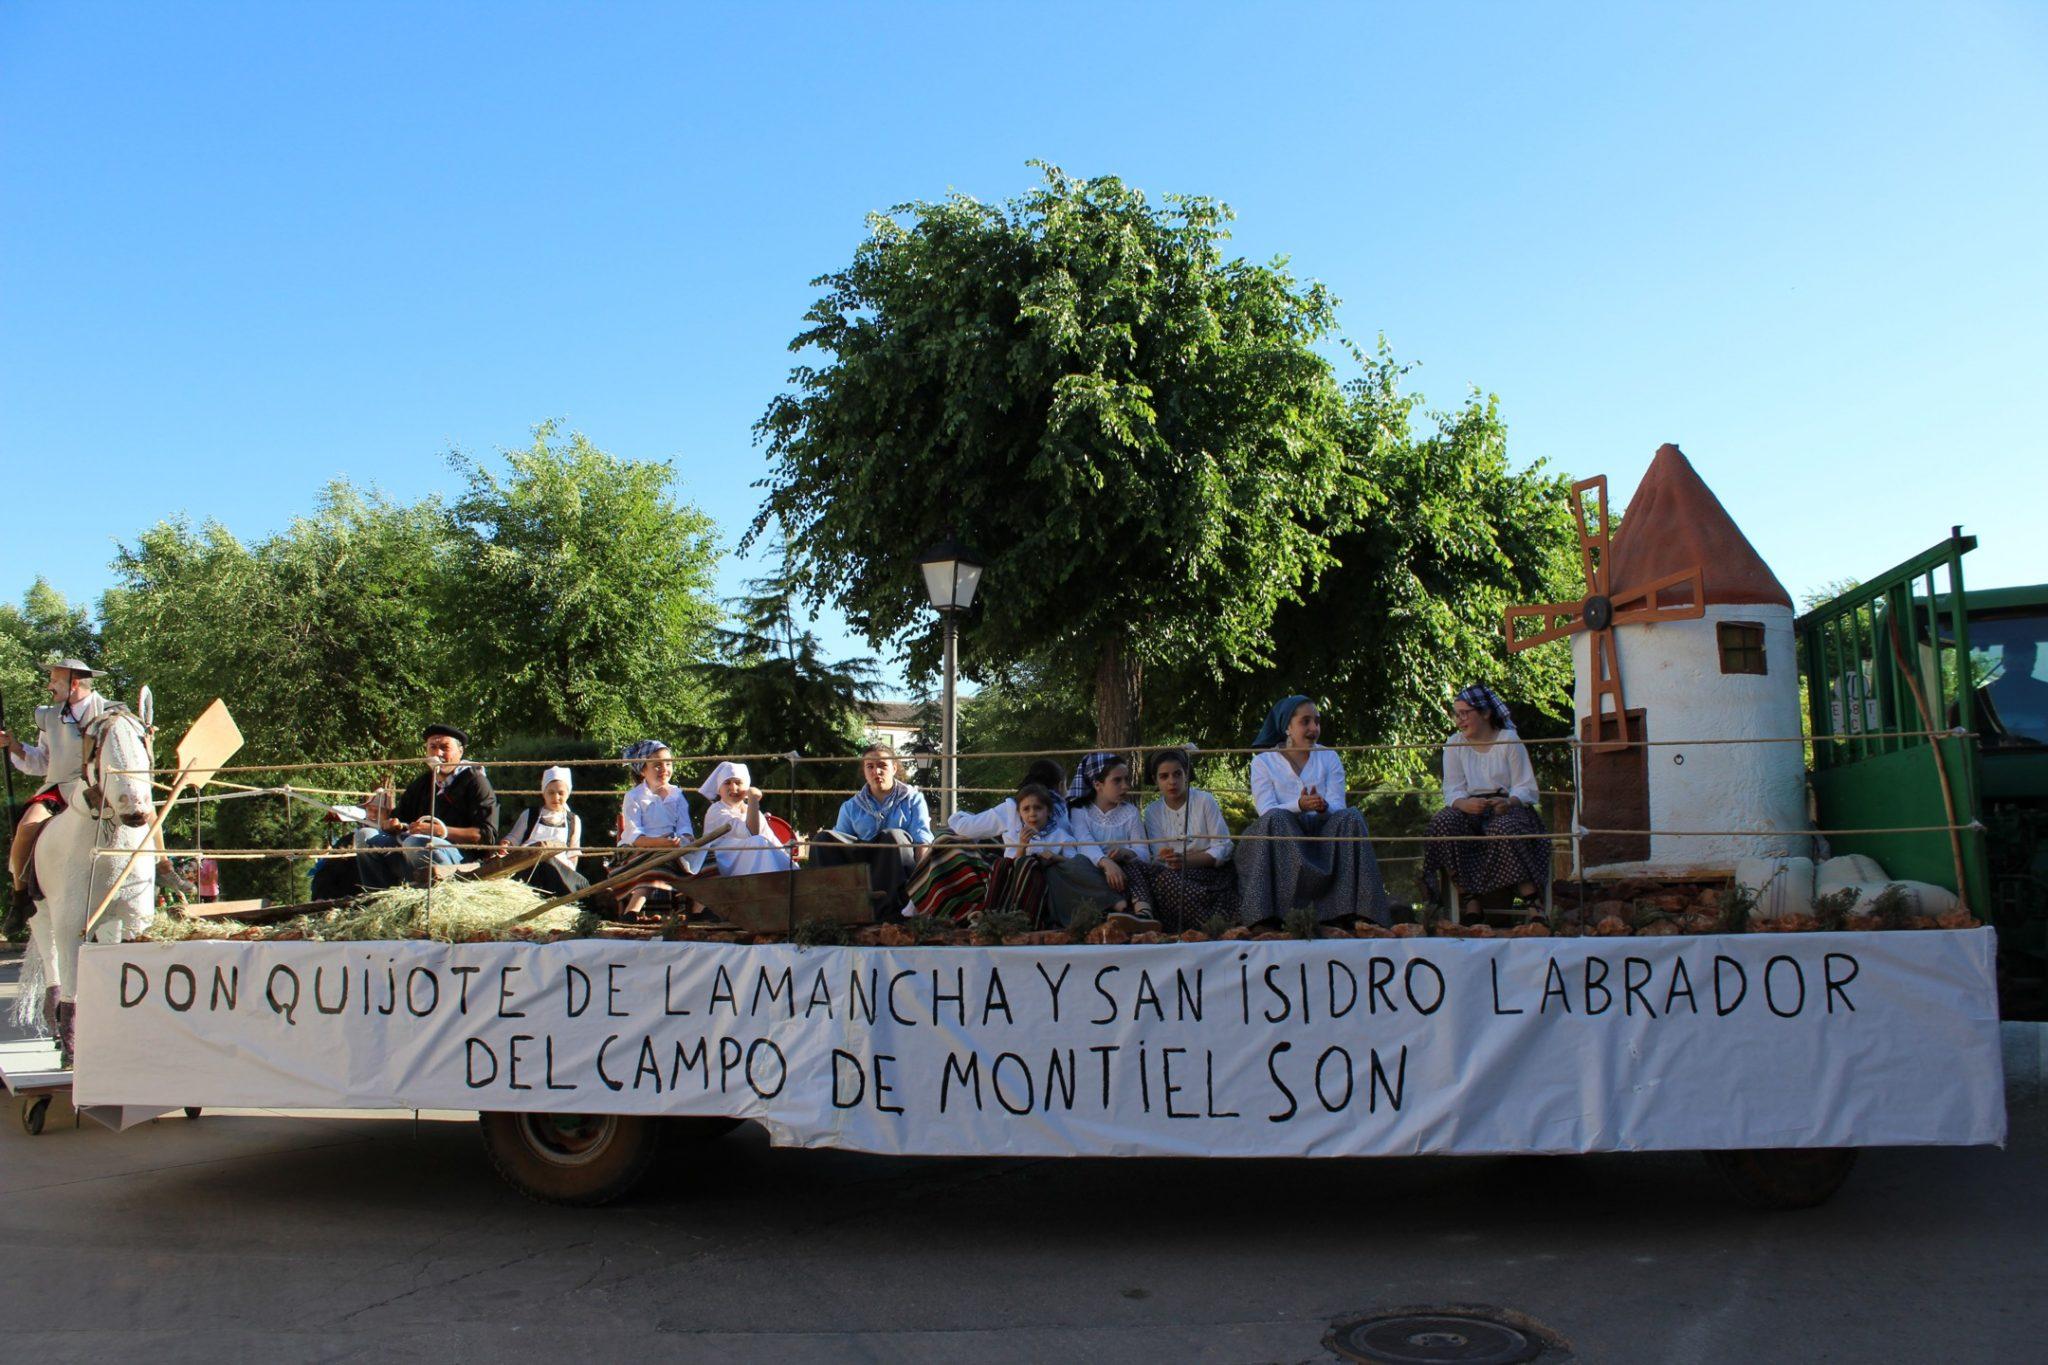 1º Premio Carrozas san isidro